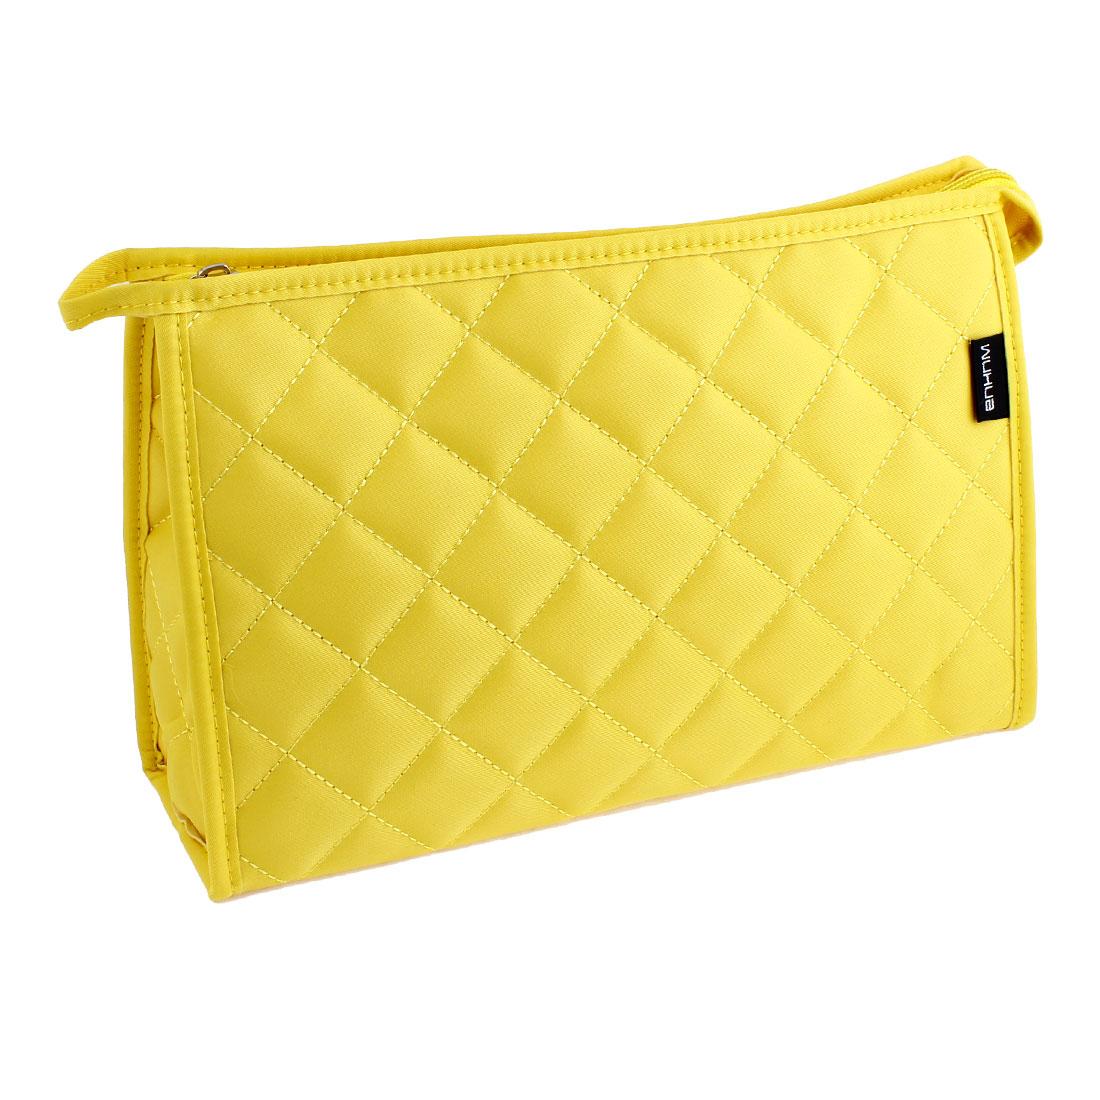 Nylon Lozenge Pattern Zip Up Mirror Pocket Makeup Cosmetics Bag Case Yellow